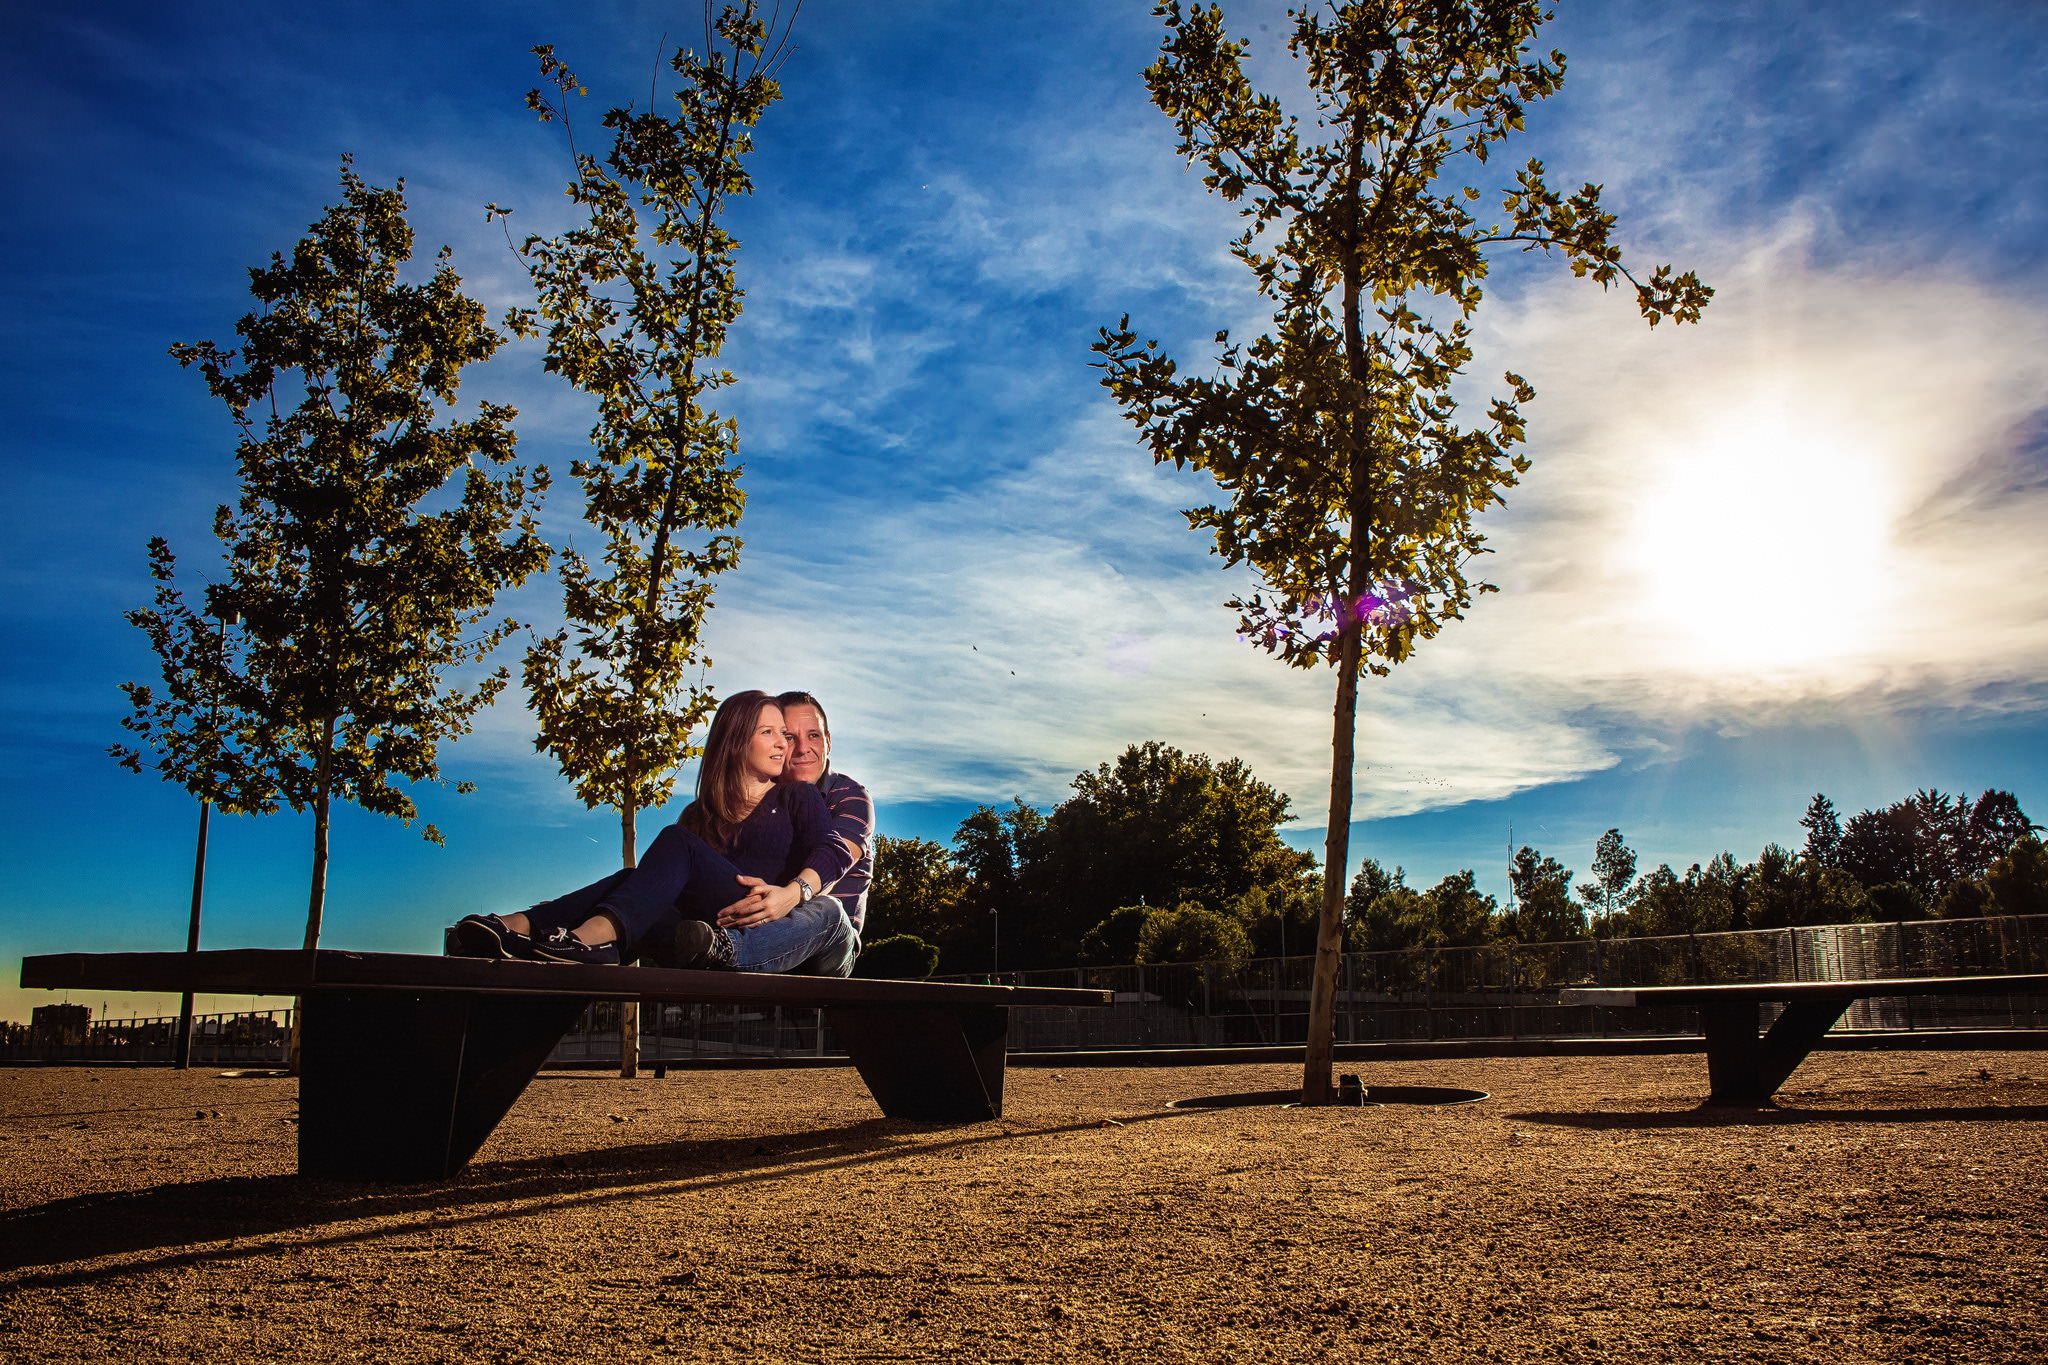 Alexandra+Mundi, fotografie de nunta, fotograf Madrid, fotograf Toledo, fotograf bucuresti, fotografie creativa, wedding day, sedinta foto de logodna, engagement, inspirephoto.ro, fotograf profesionist, sesiune foto inainte de nunta